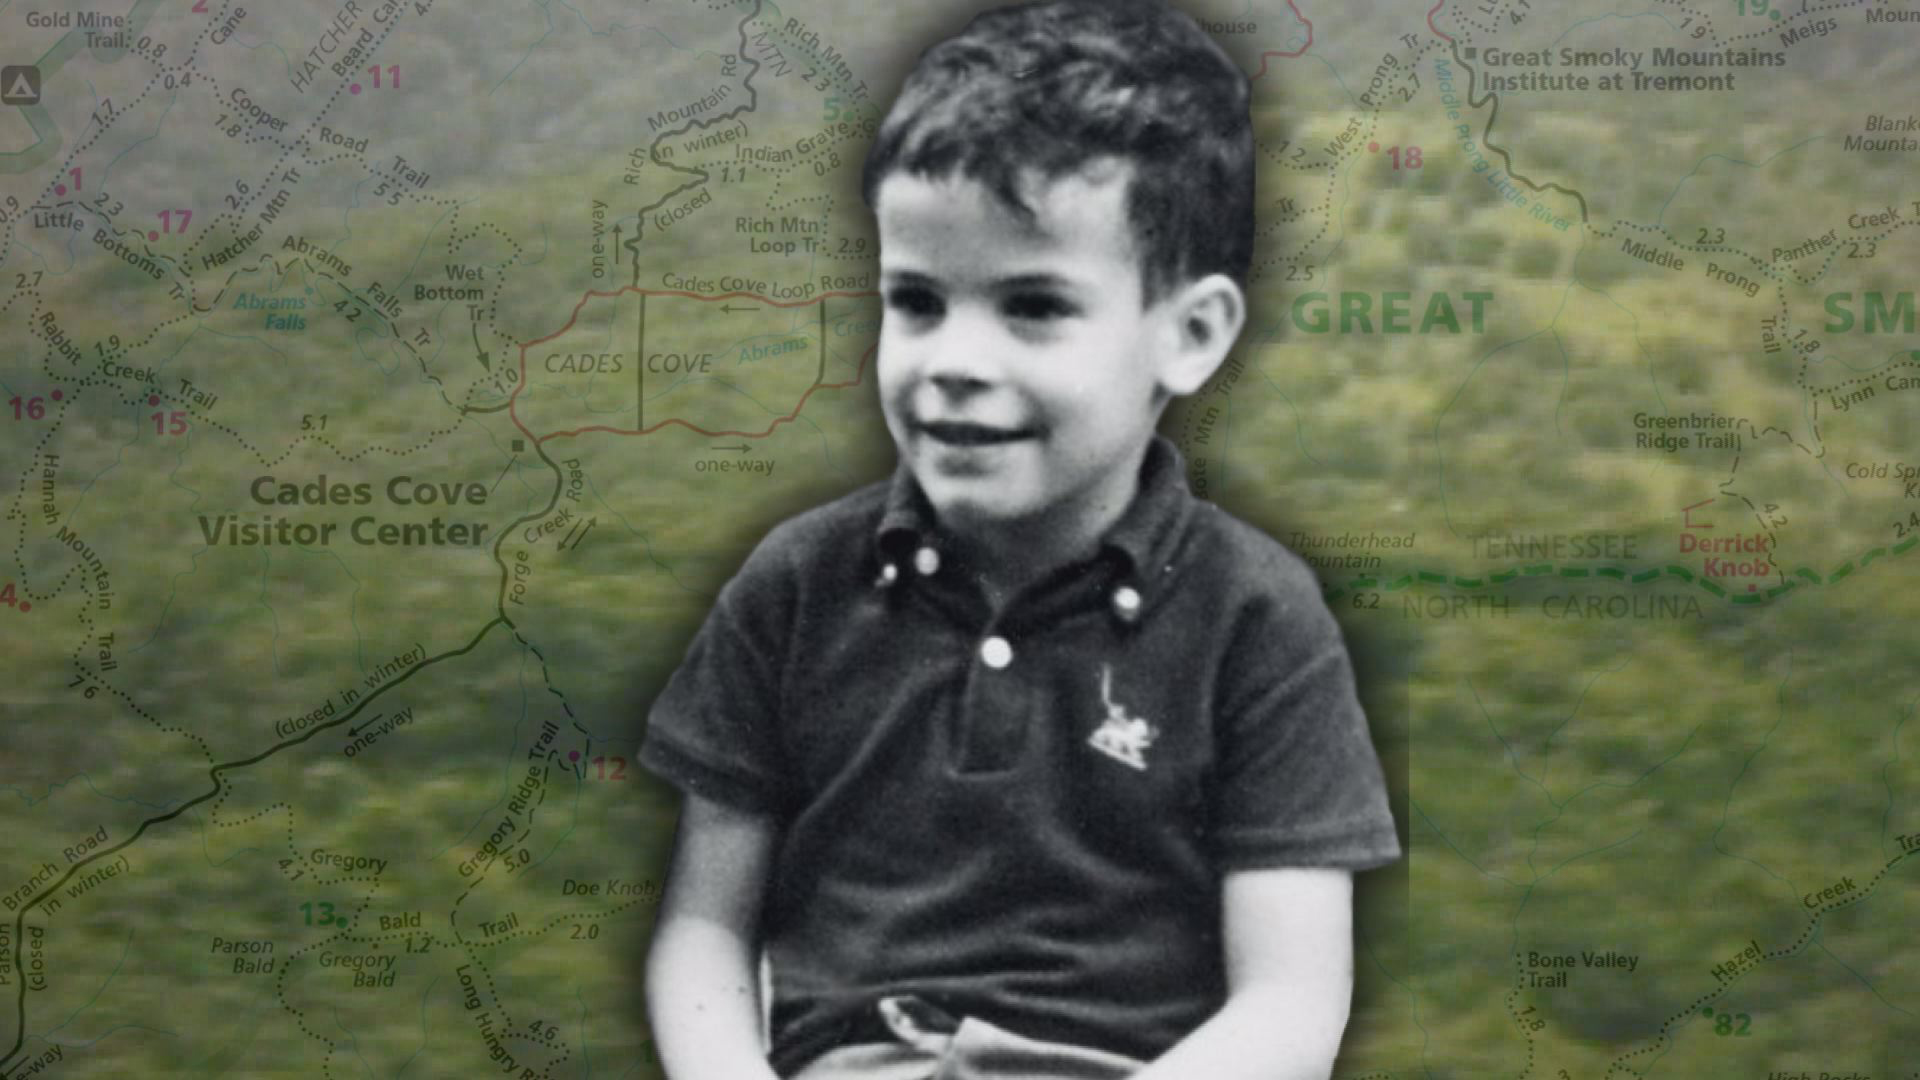 Wbir Weather And News >> wbir.com | Dennis Martin: Lost boy a 45-year Smoky Mountain mystery